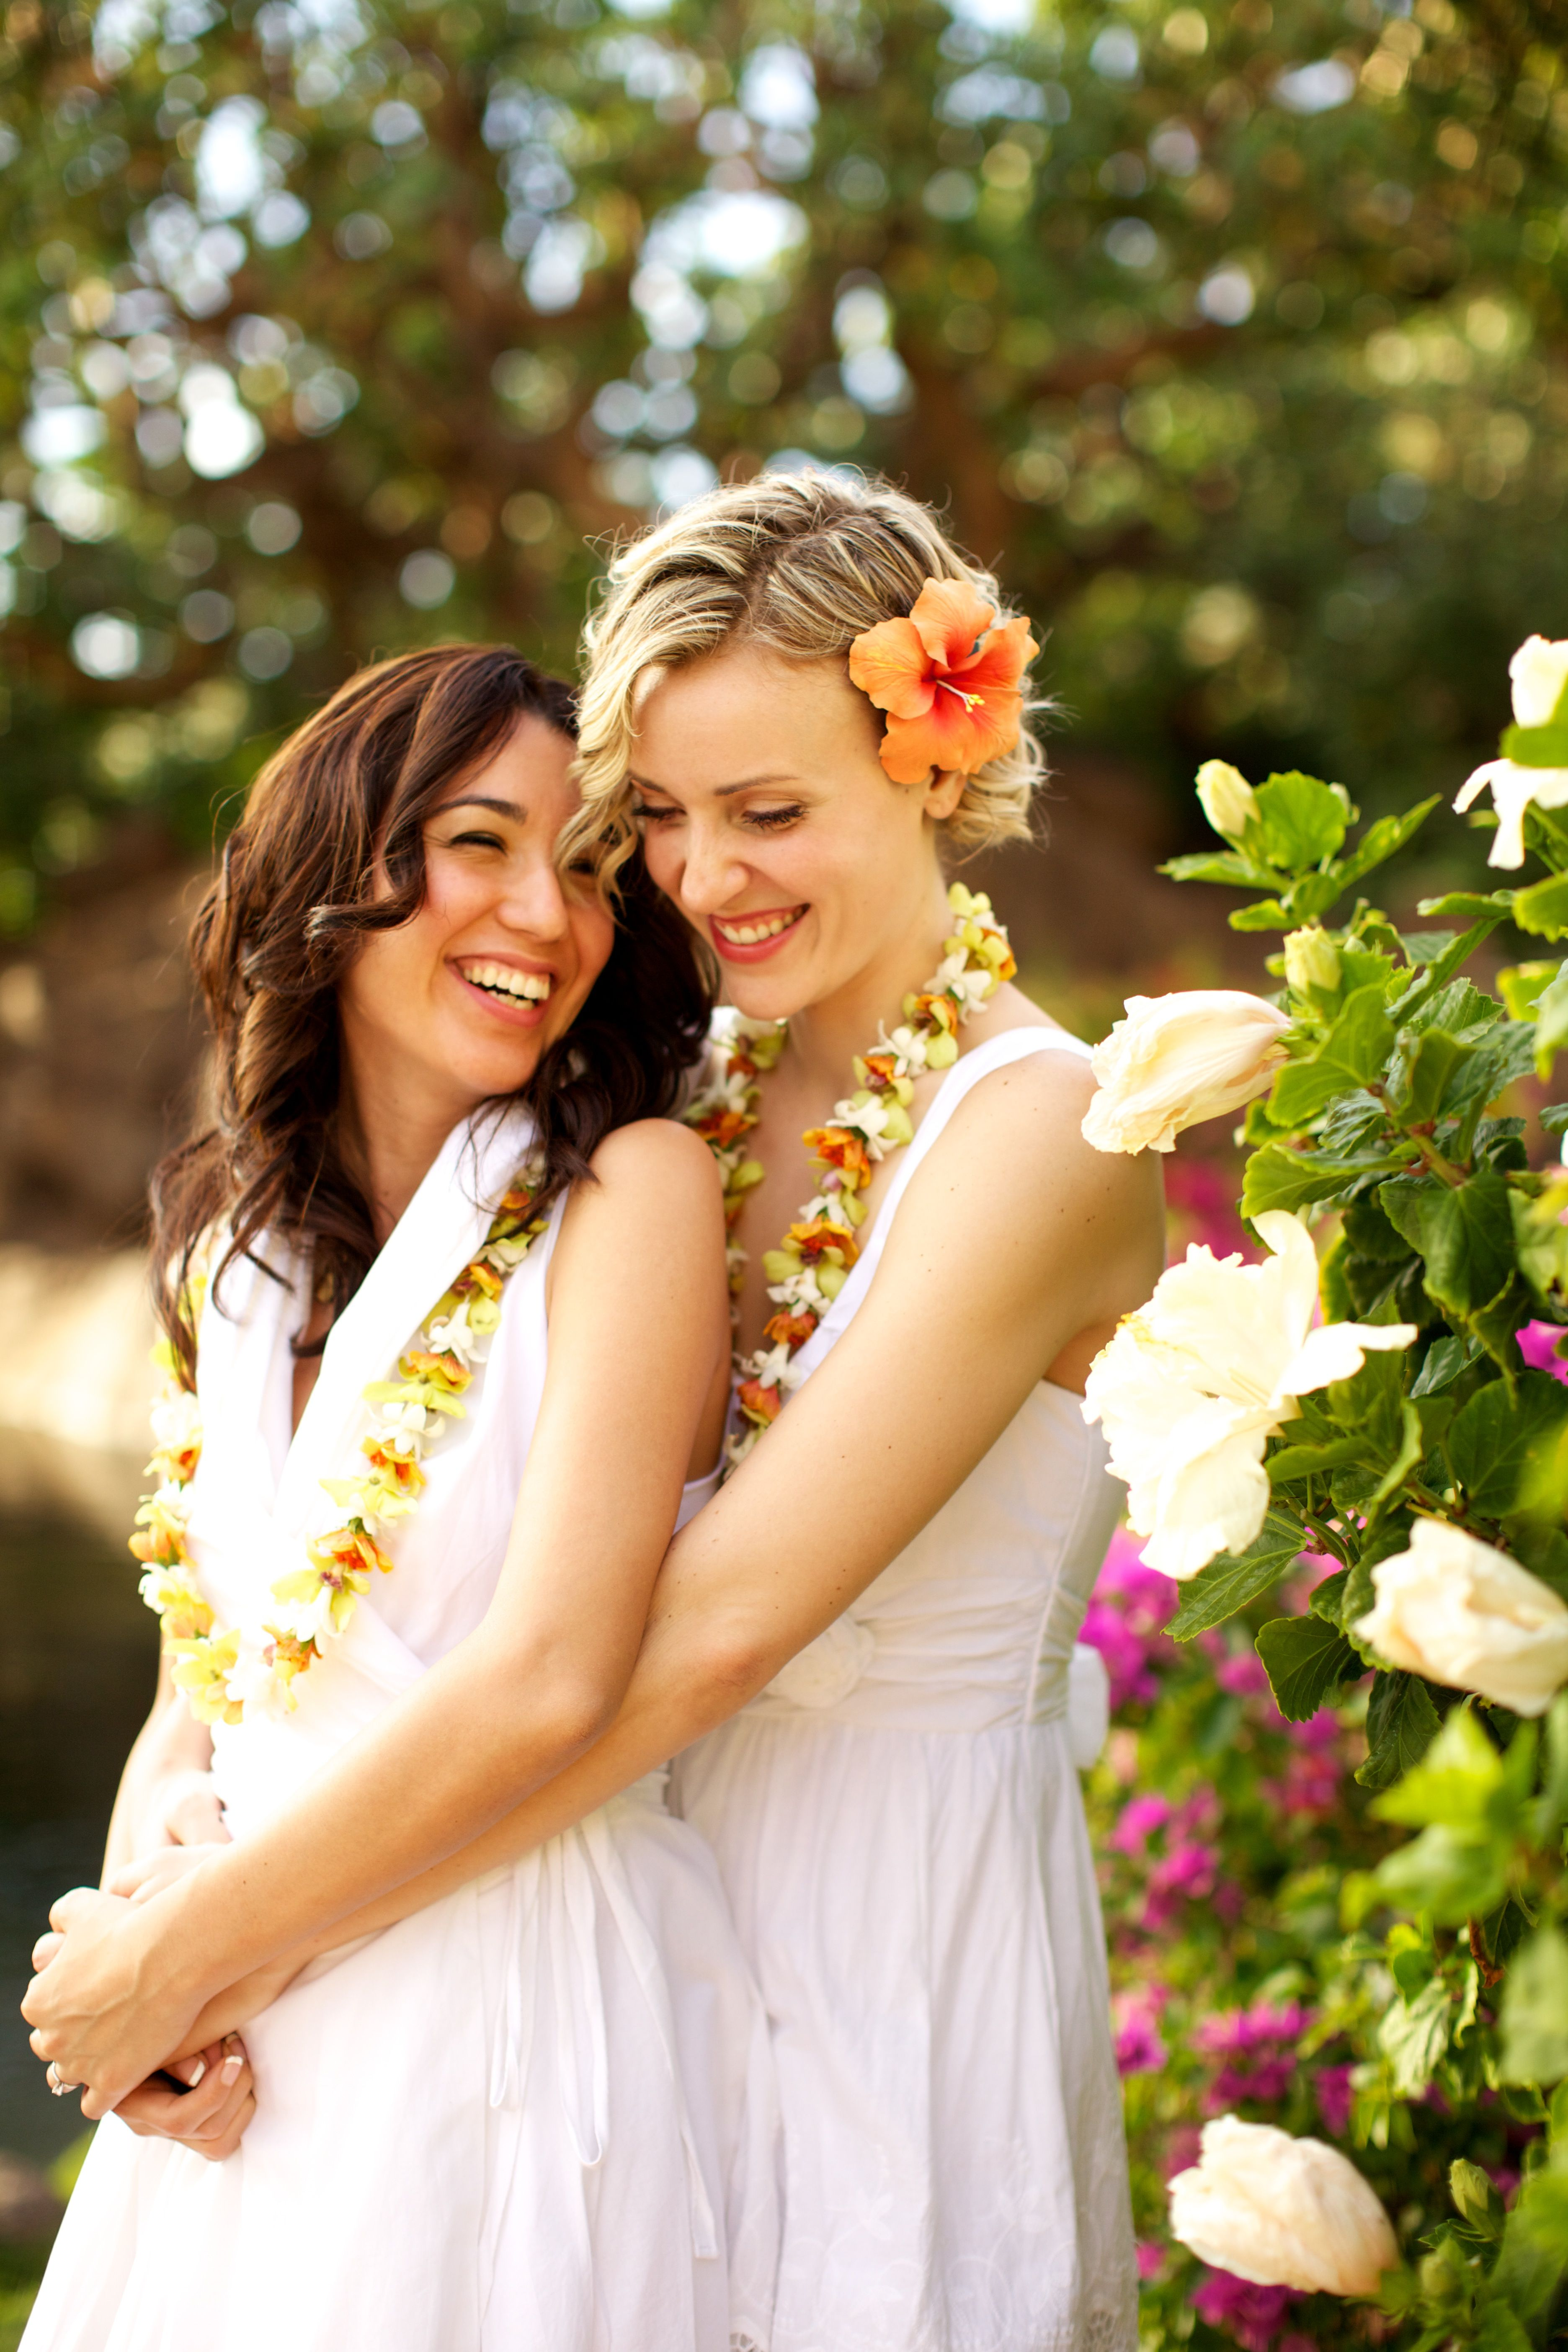 lesbian wedding ideas Two Brides From Dallas Tie The Knot Like the flowers Lesbian PrideLesbian WeddingLesbian